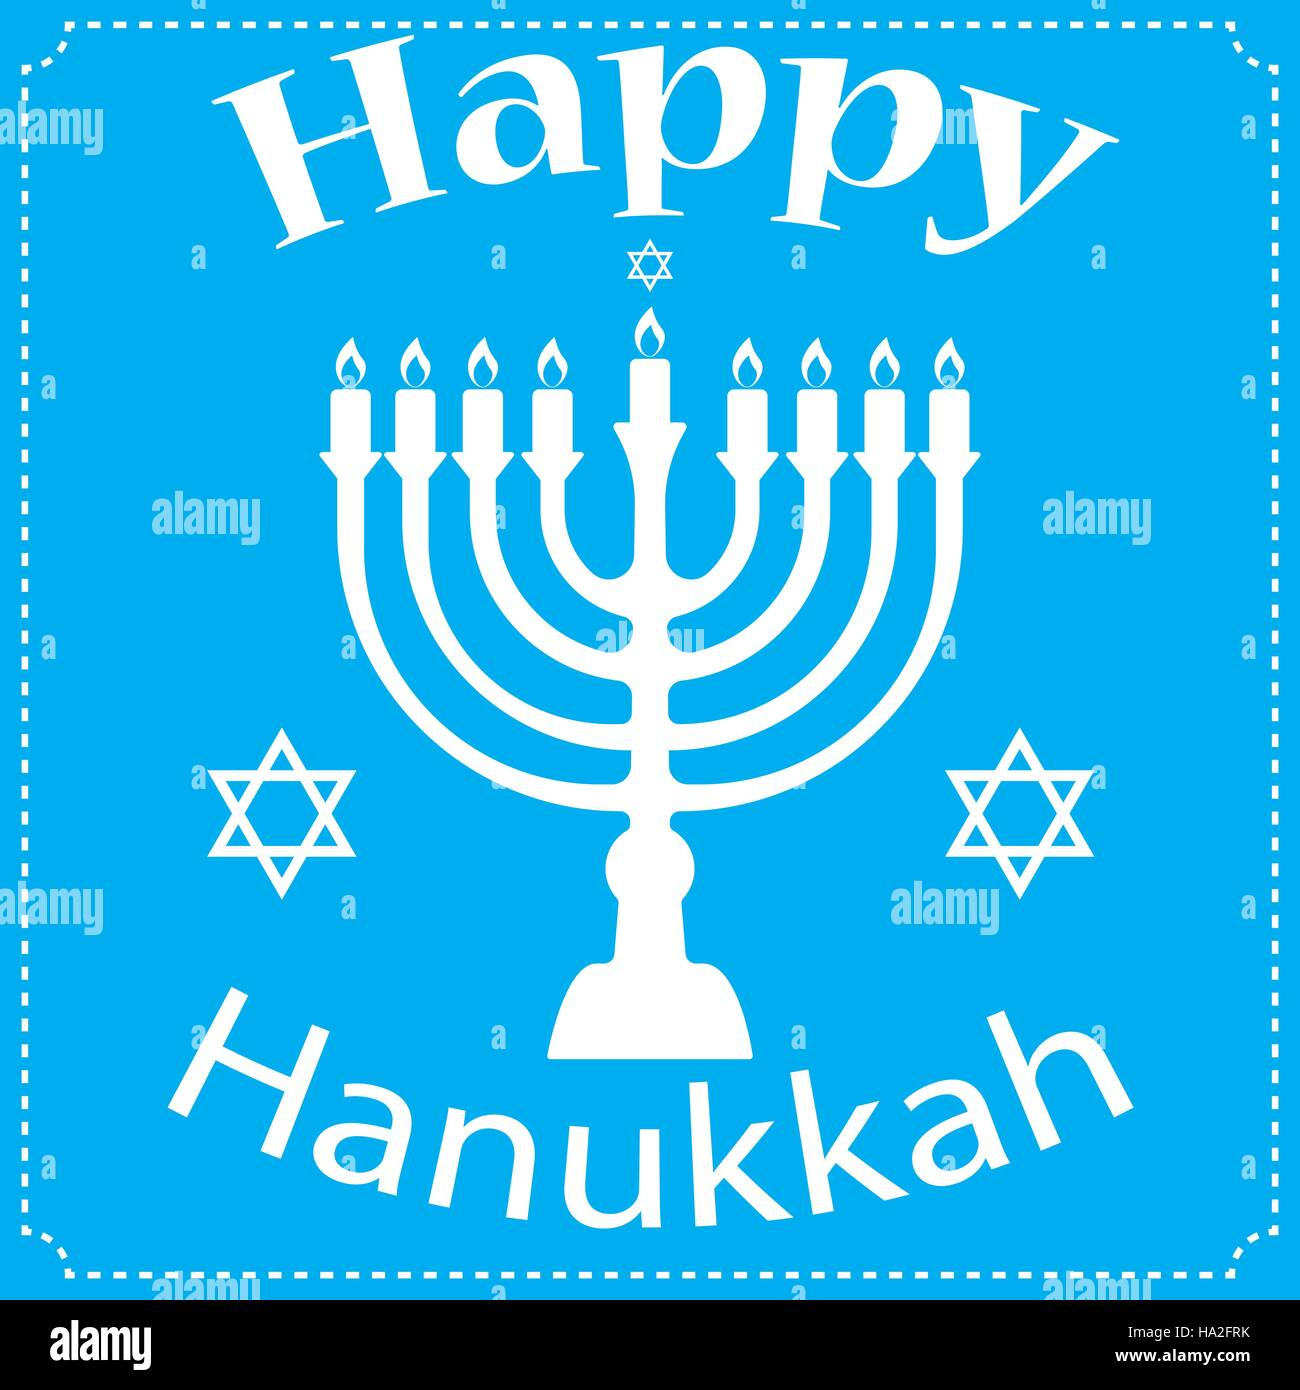 Hanukkah Typographic Vector Design - Happy Hanukkah. Jewish holiday. Hanukkah Menorah on Light Blue Background Stock Vector